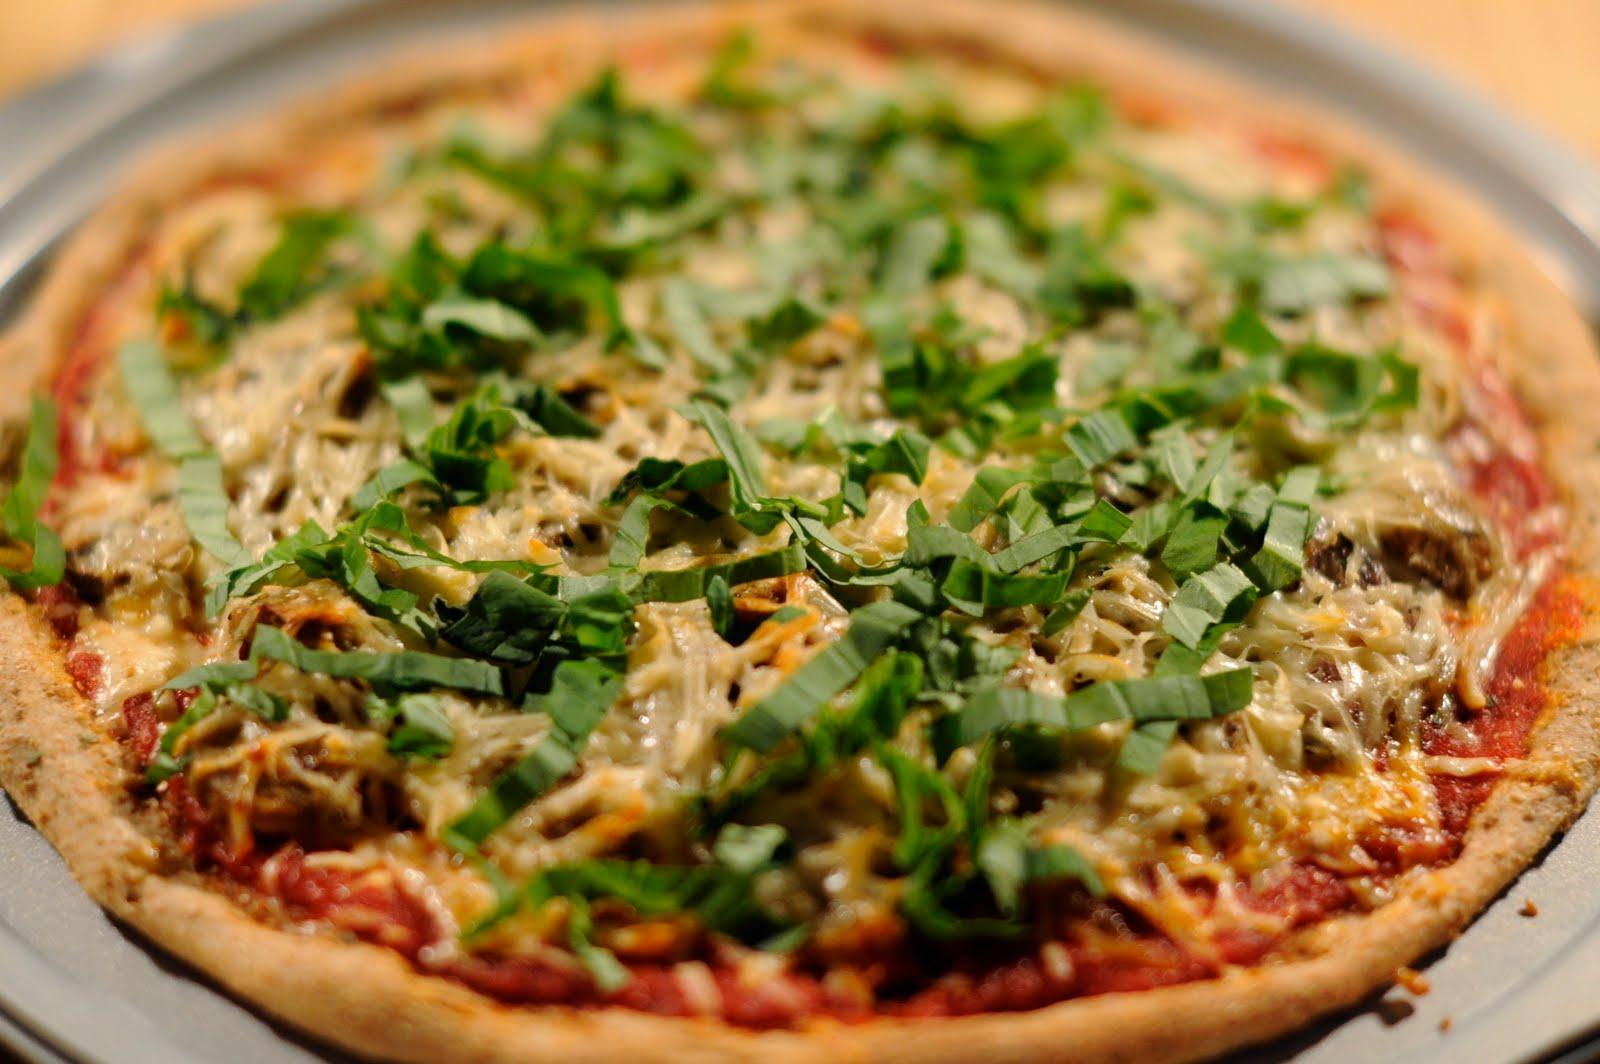 Vegan pizza, delicious